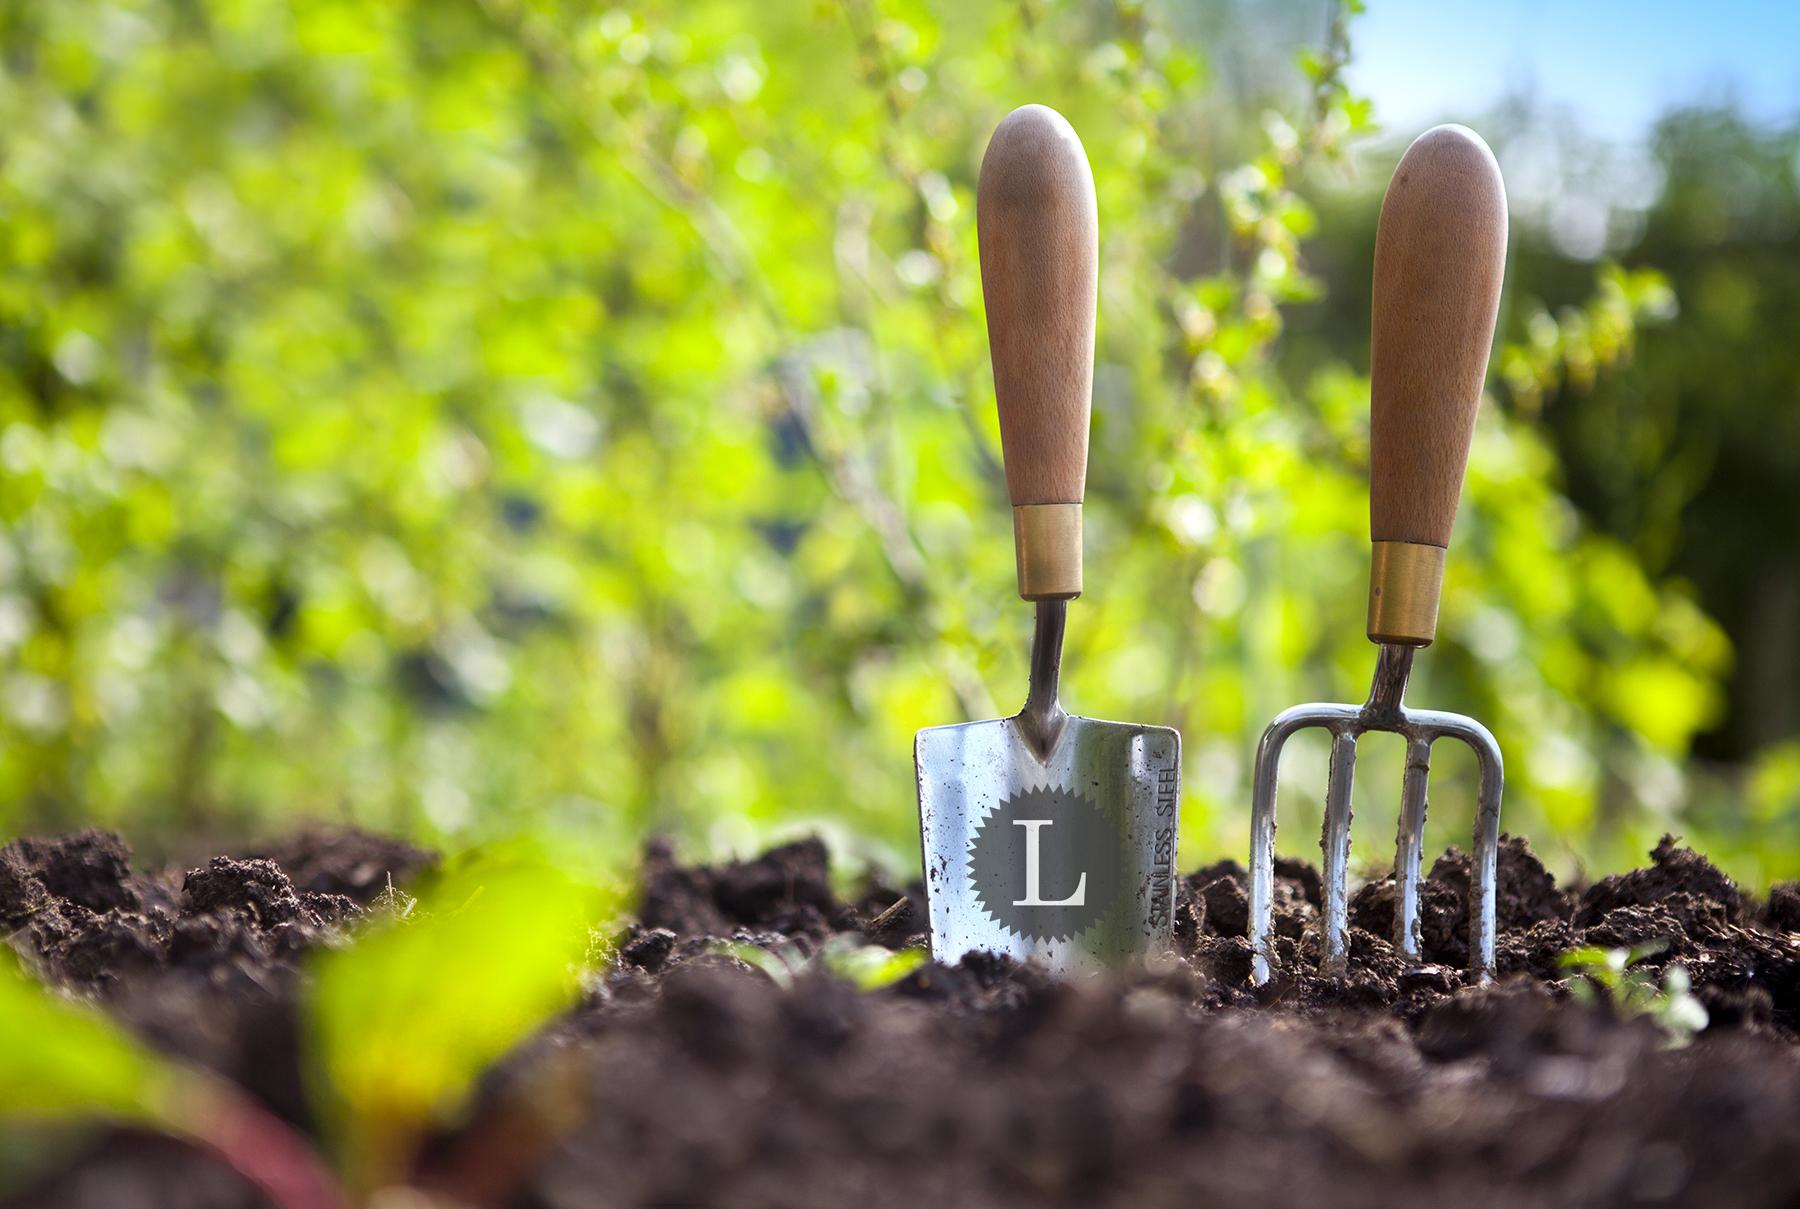 gardening-tools-soil33.jpg